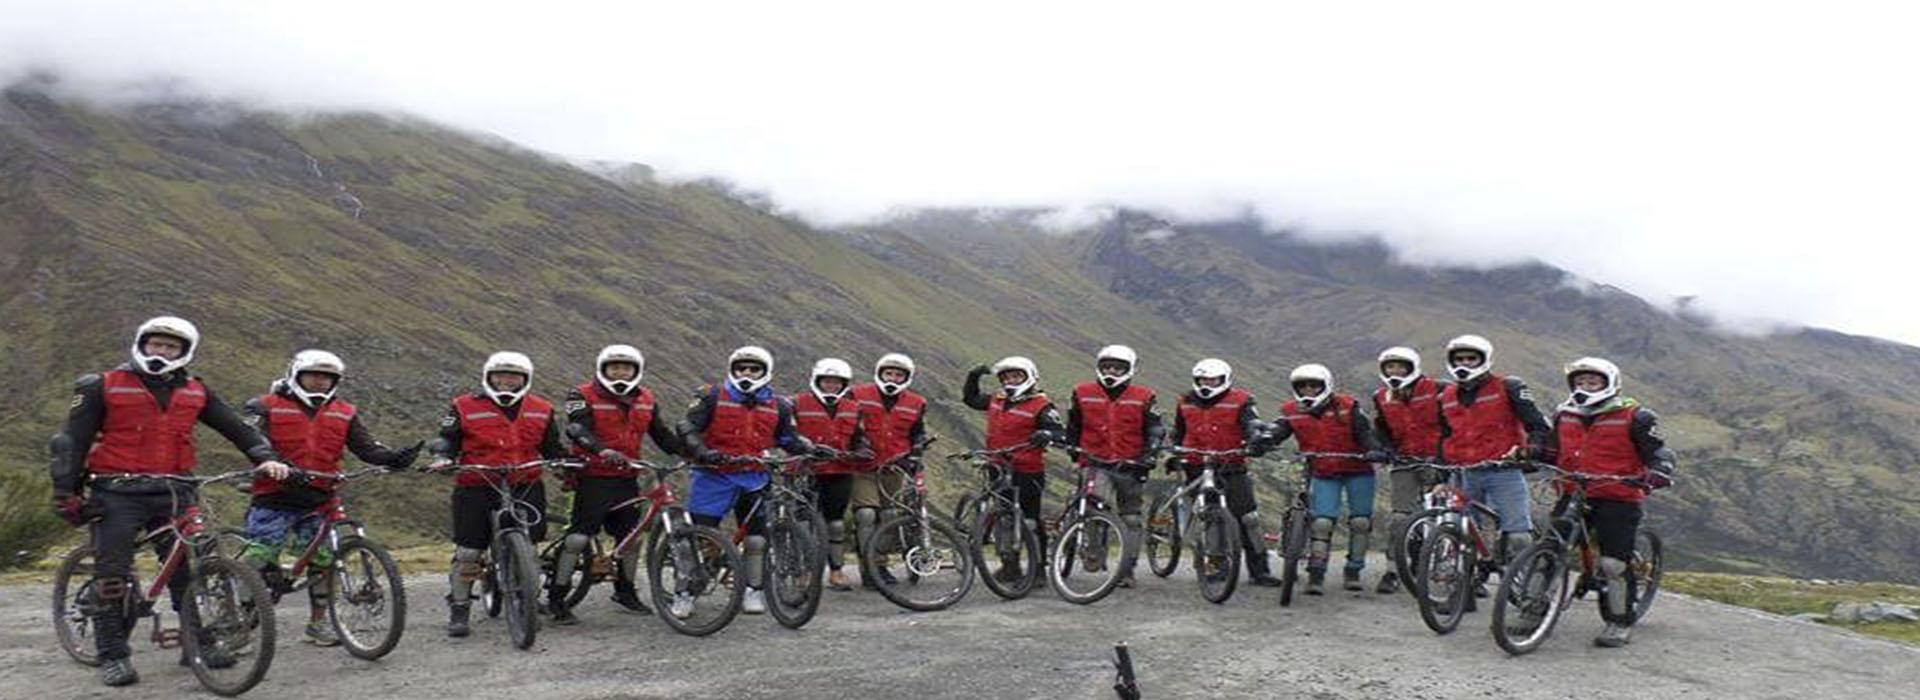 Inka Jungle Trek to Machu Picchu 4 days return by bus last day